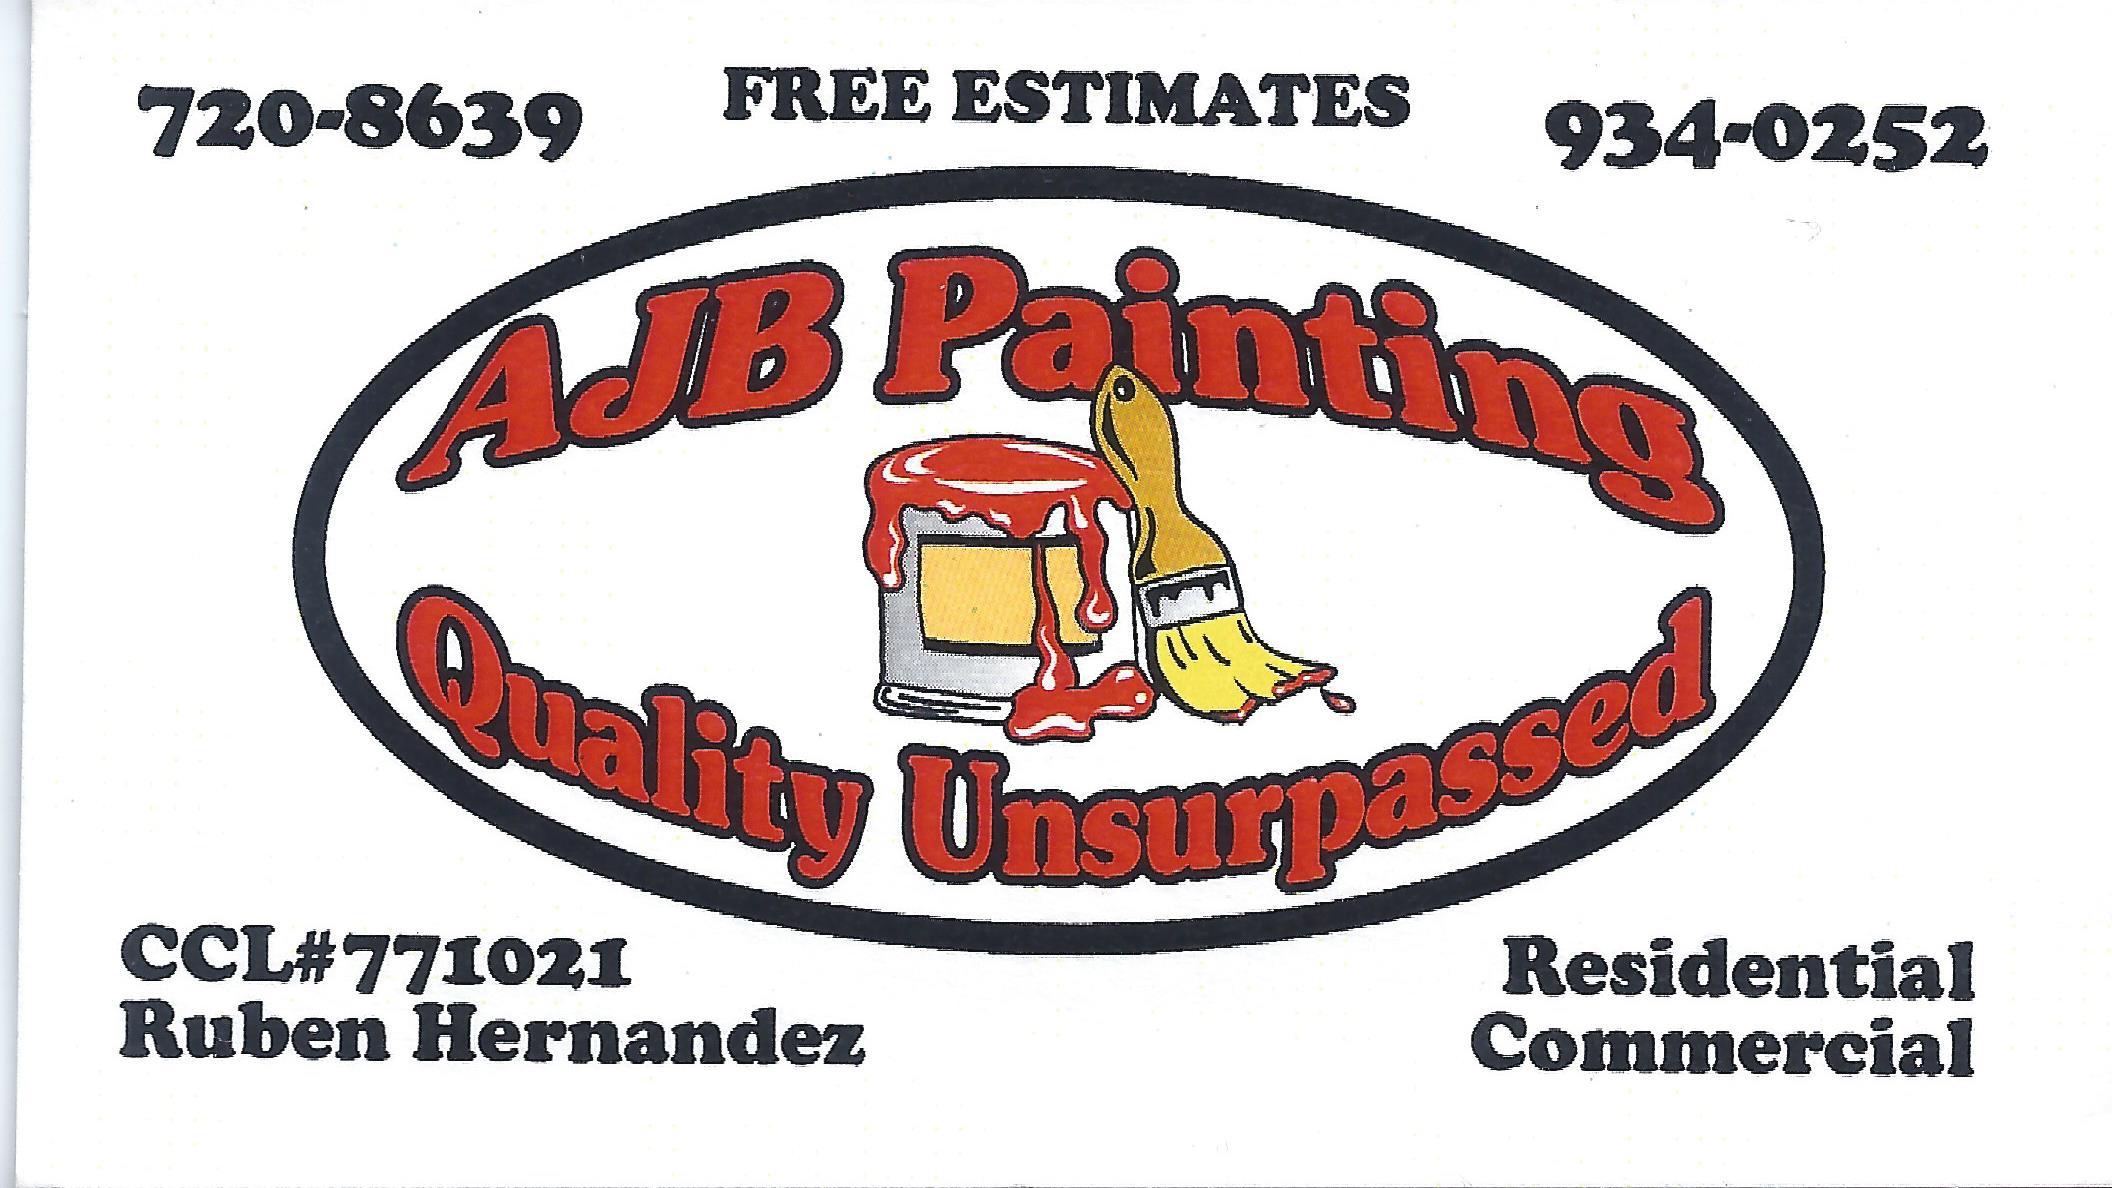 AJB Painting